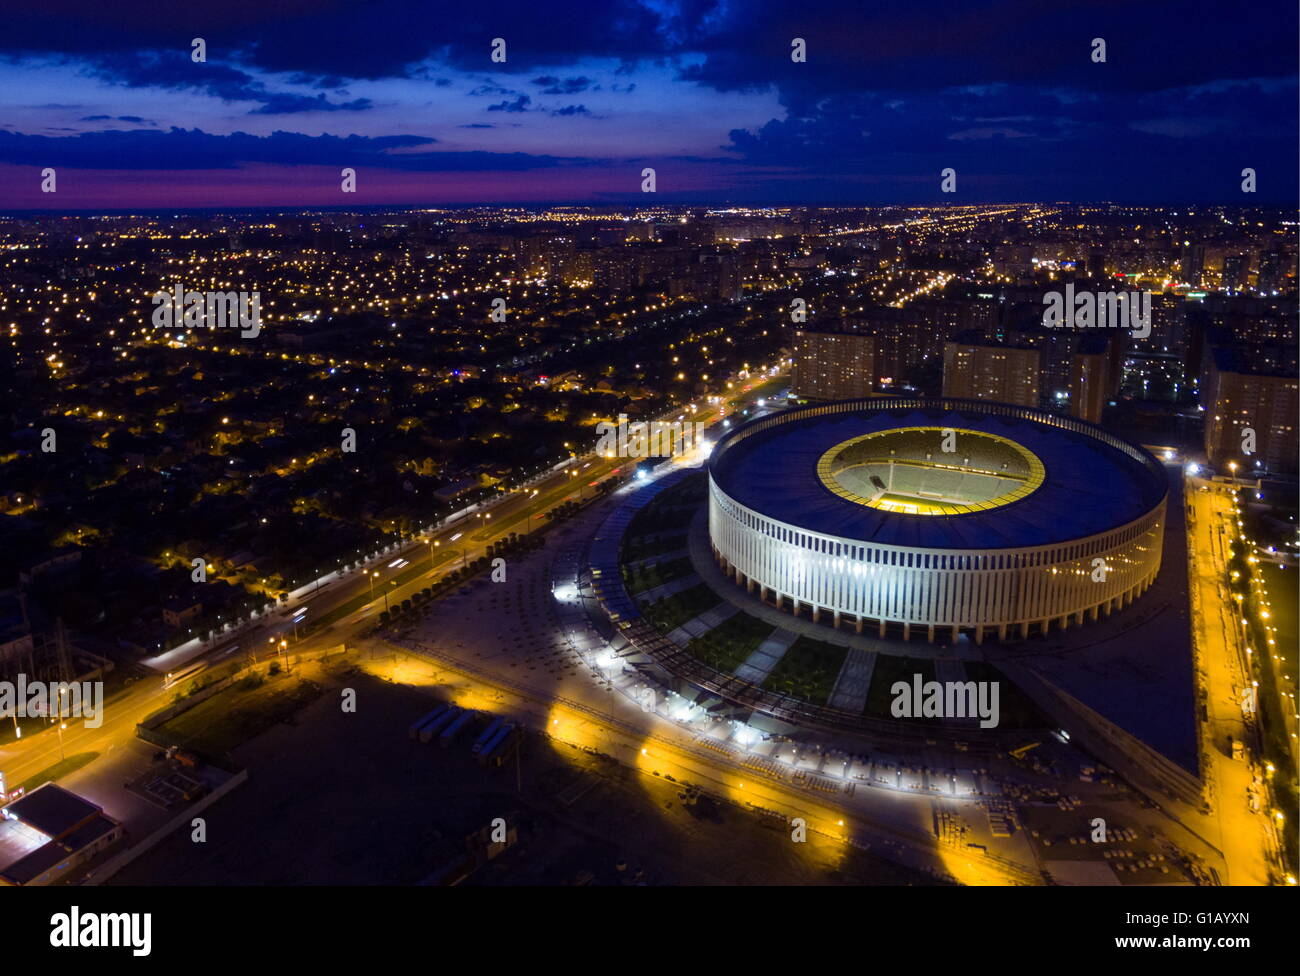 KRASNODAR, Russia. Maggio 8, 2016. Una vista di Krasnodar Stadium. Vitaly Timkiv/TASS Immagini Stock